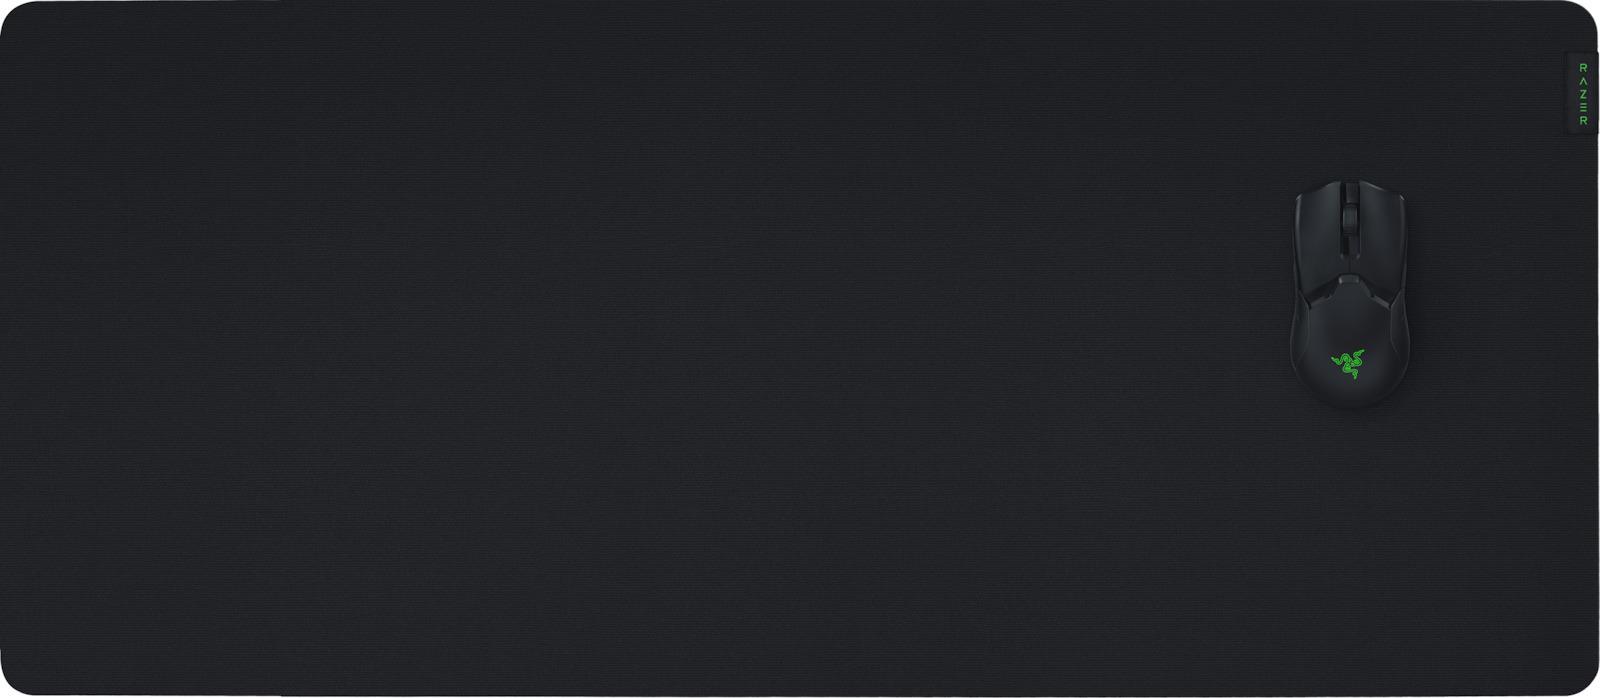 Razer Gigantus V2 XXL (RZ02-03330400-R3M1) - Πληρωμή και σε έως 36 Δόσεις!!!